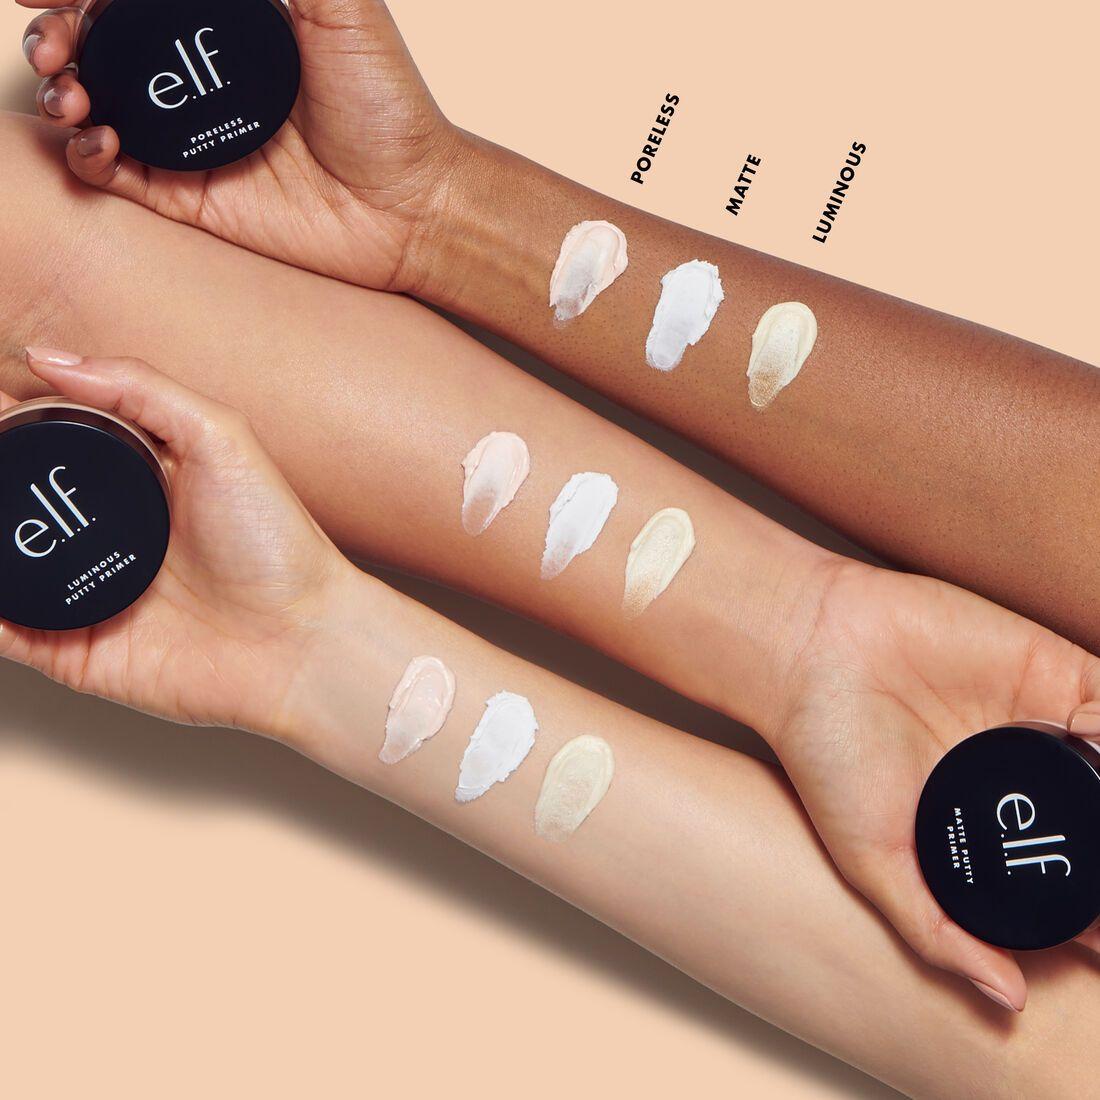 elf Poreless Putty Primer in 2020 Lip lacquer, Makeup